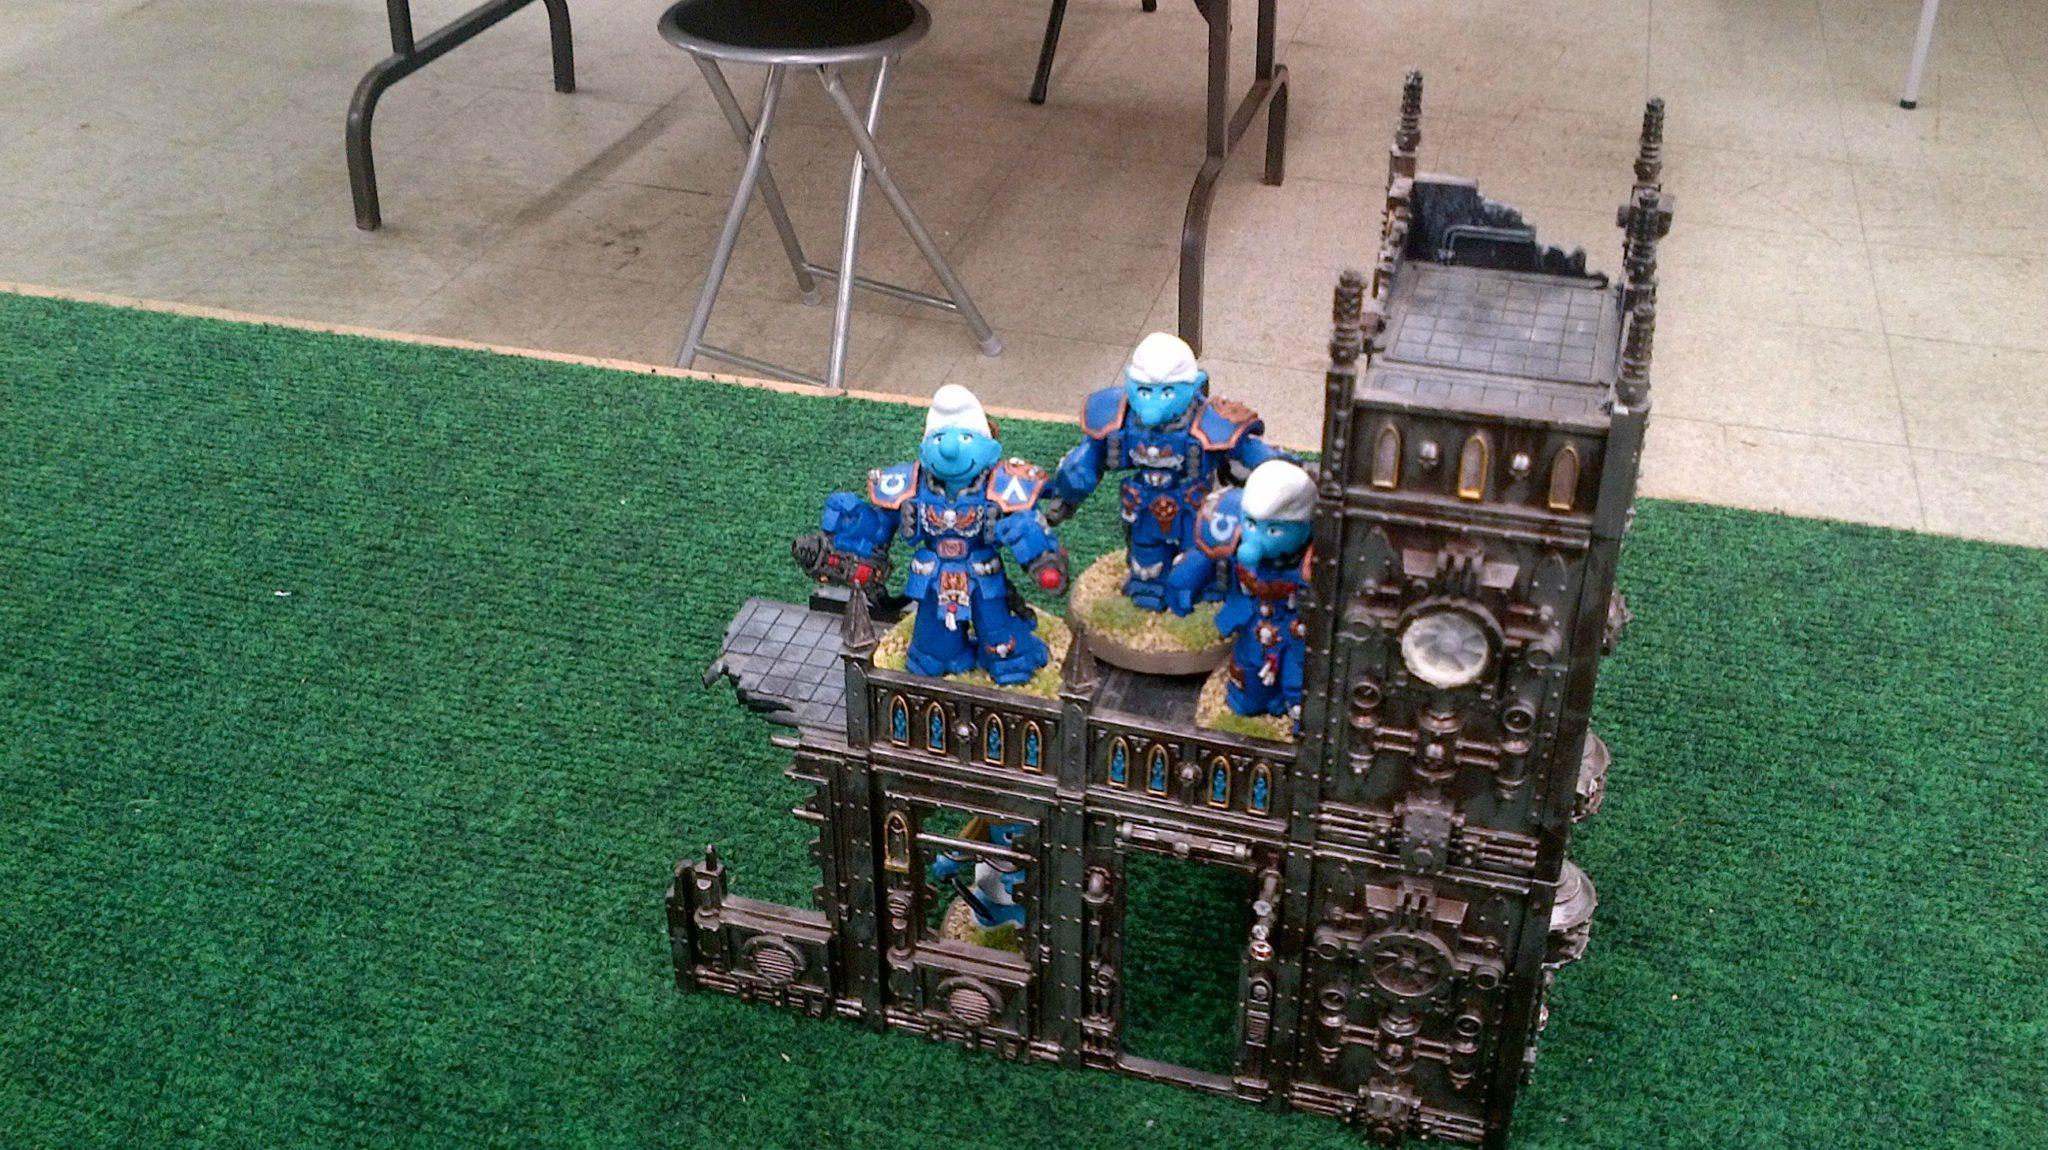 Smurf Centurions